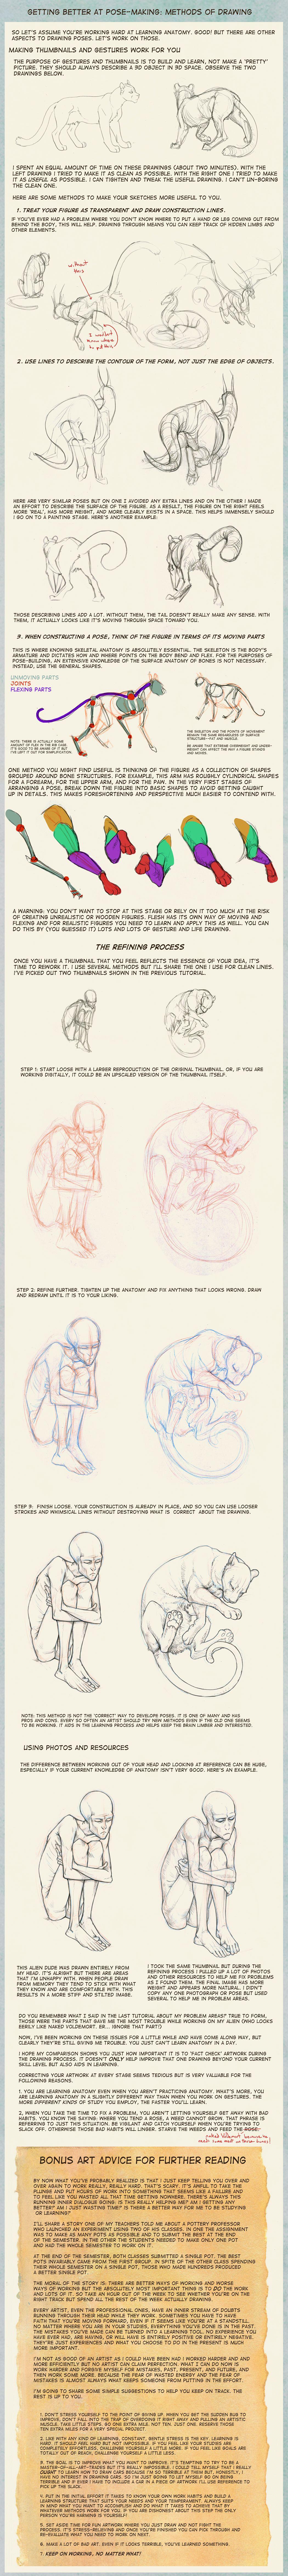 Dragon Tutorial Part II by ~cheesefreeak on deviantART | Animal ...